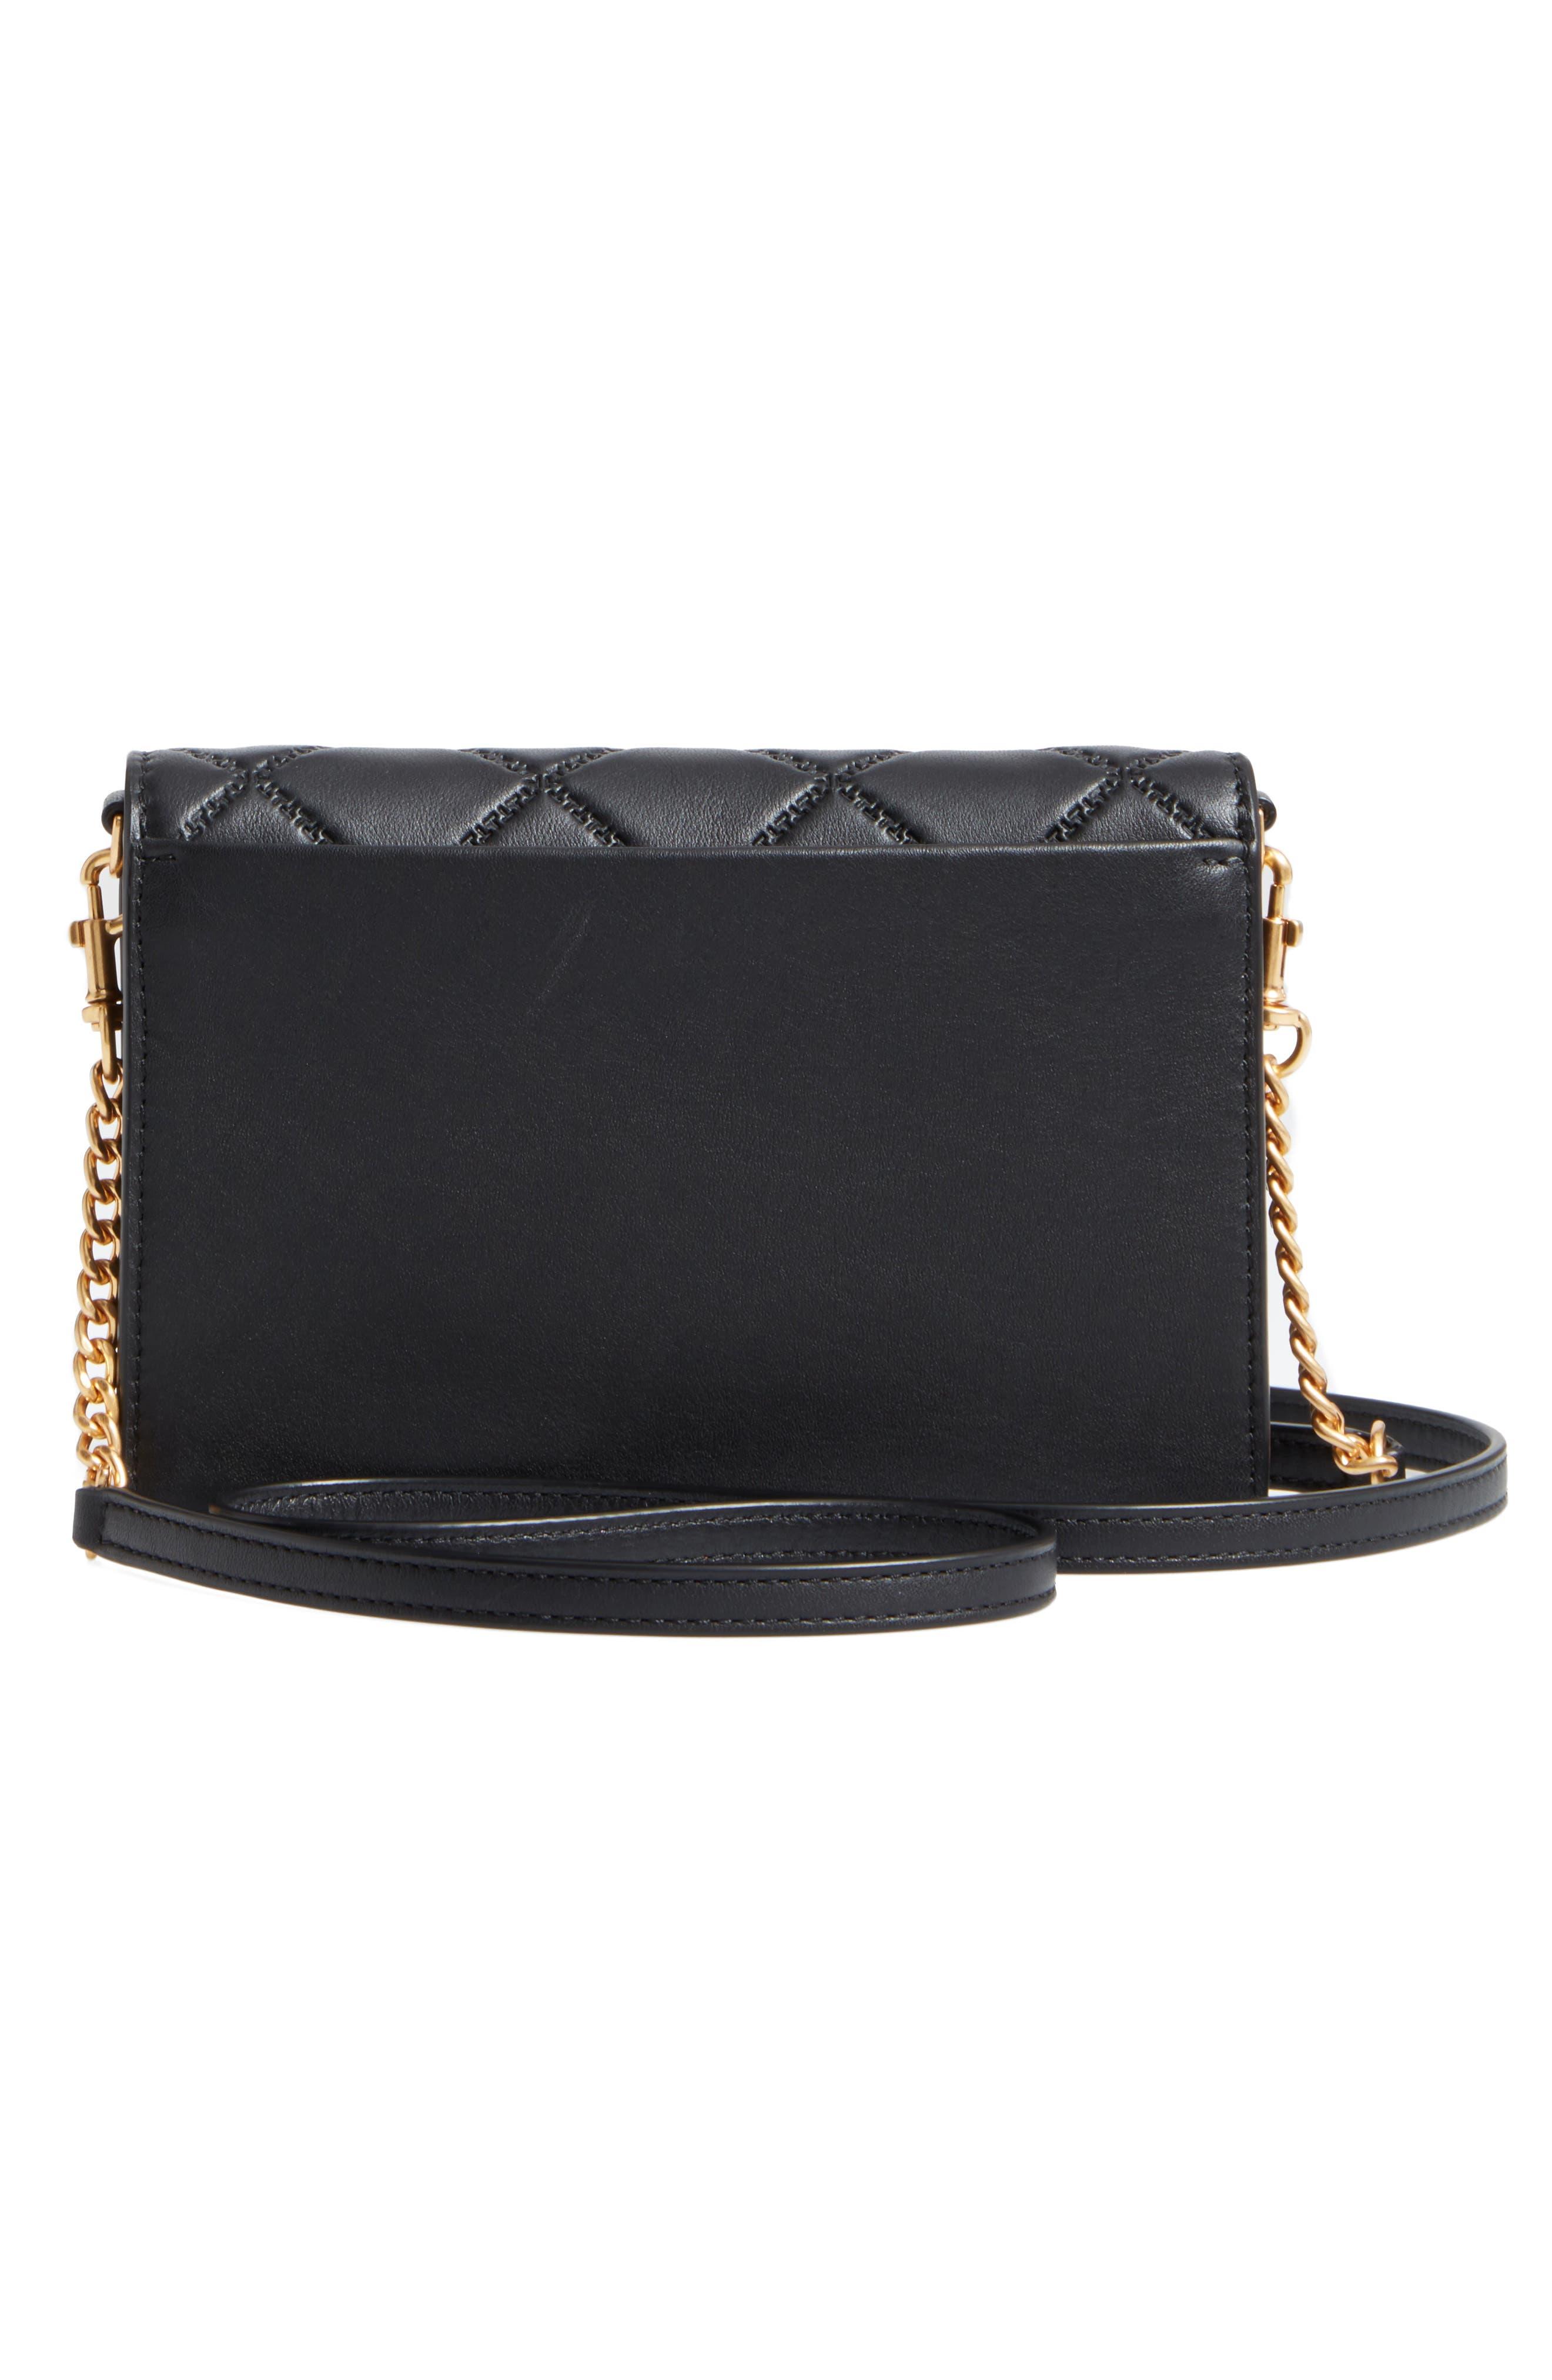 Mini Georgia Quilted Leather Shoulder Bag,                             Alternate thumbnail 3, color,                             001